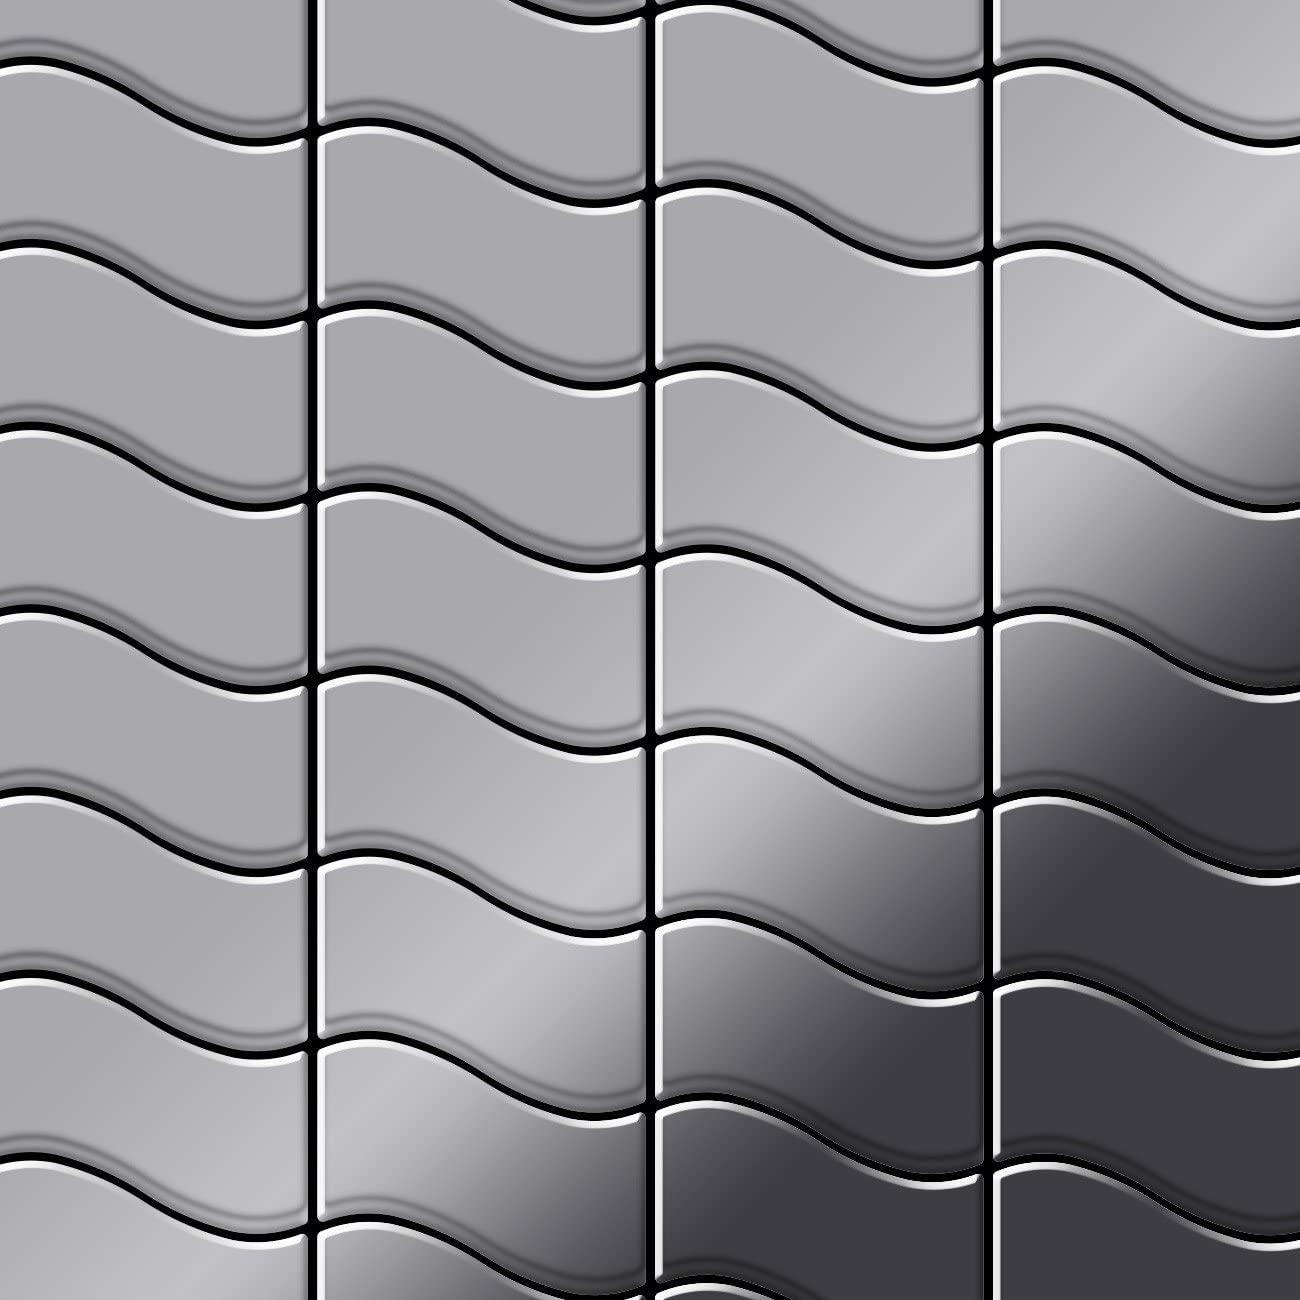 Mosaic Tile massiv Metal Stainless Steel Marine Mirror Grey 1.6mm Thick ALLOY Flux-S-S-MM Designed by Karim Rashid